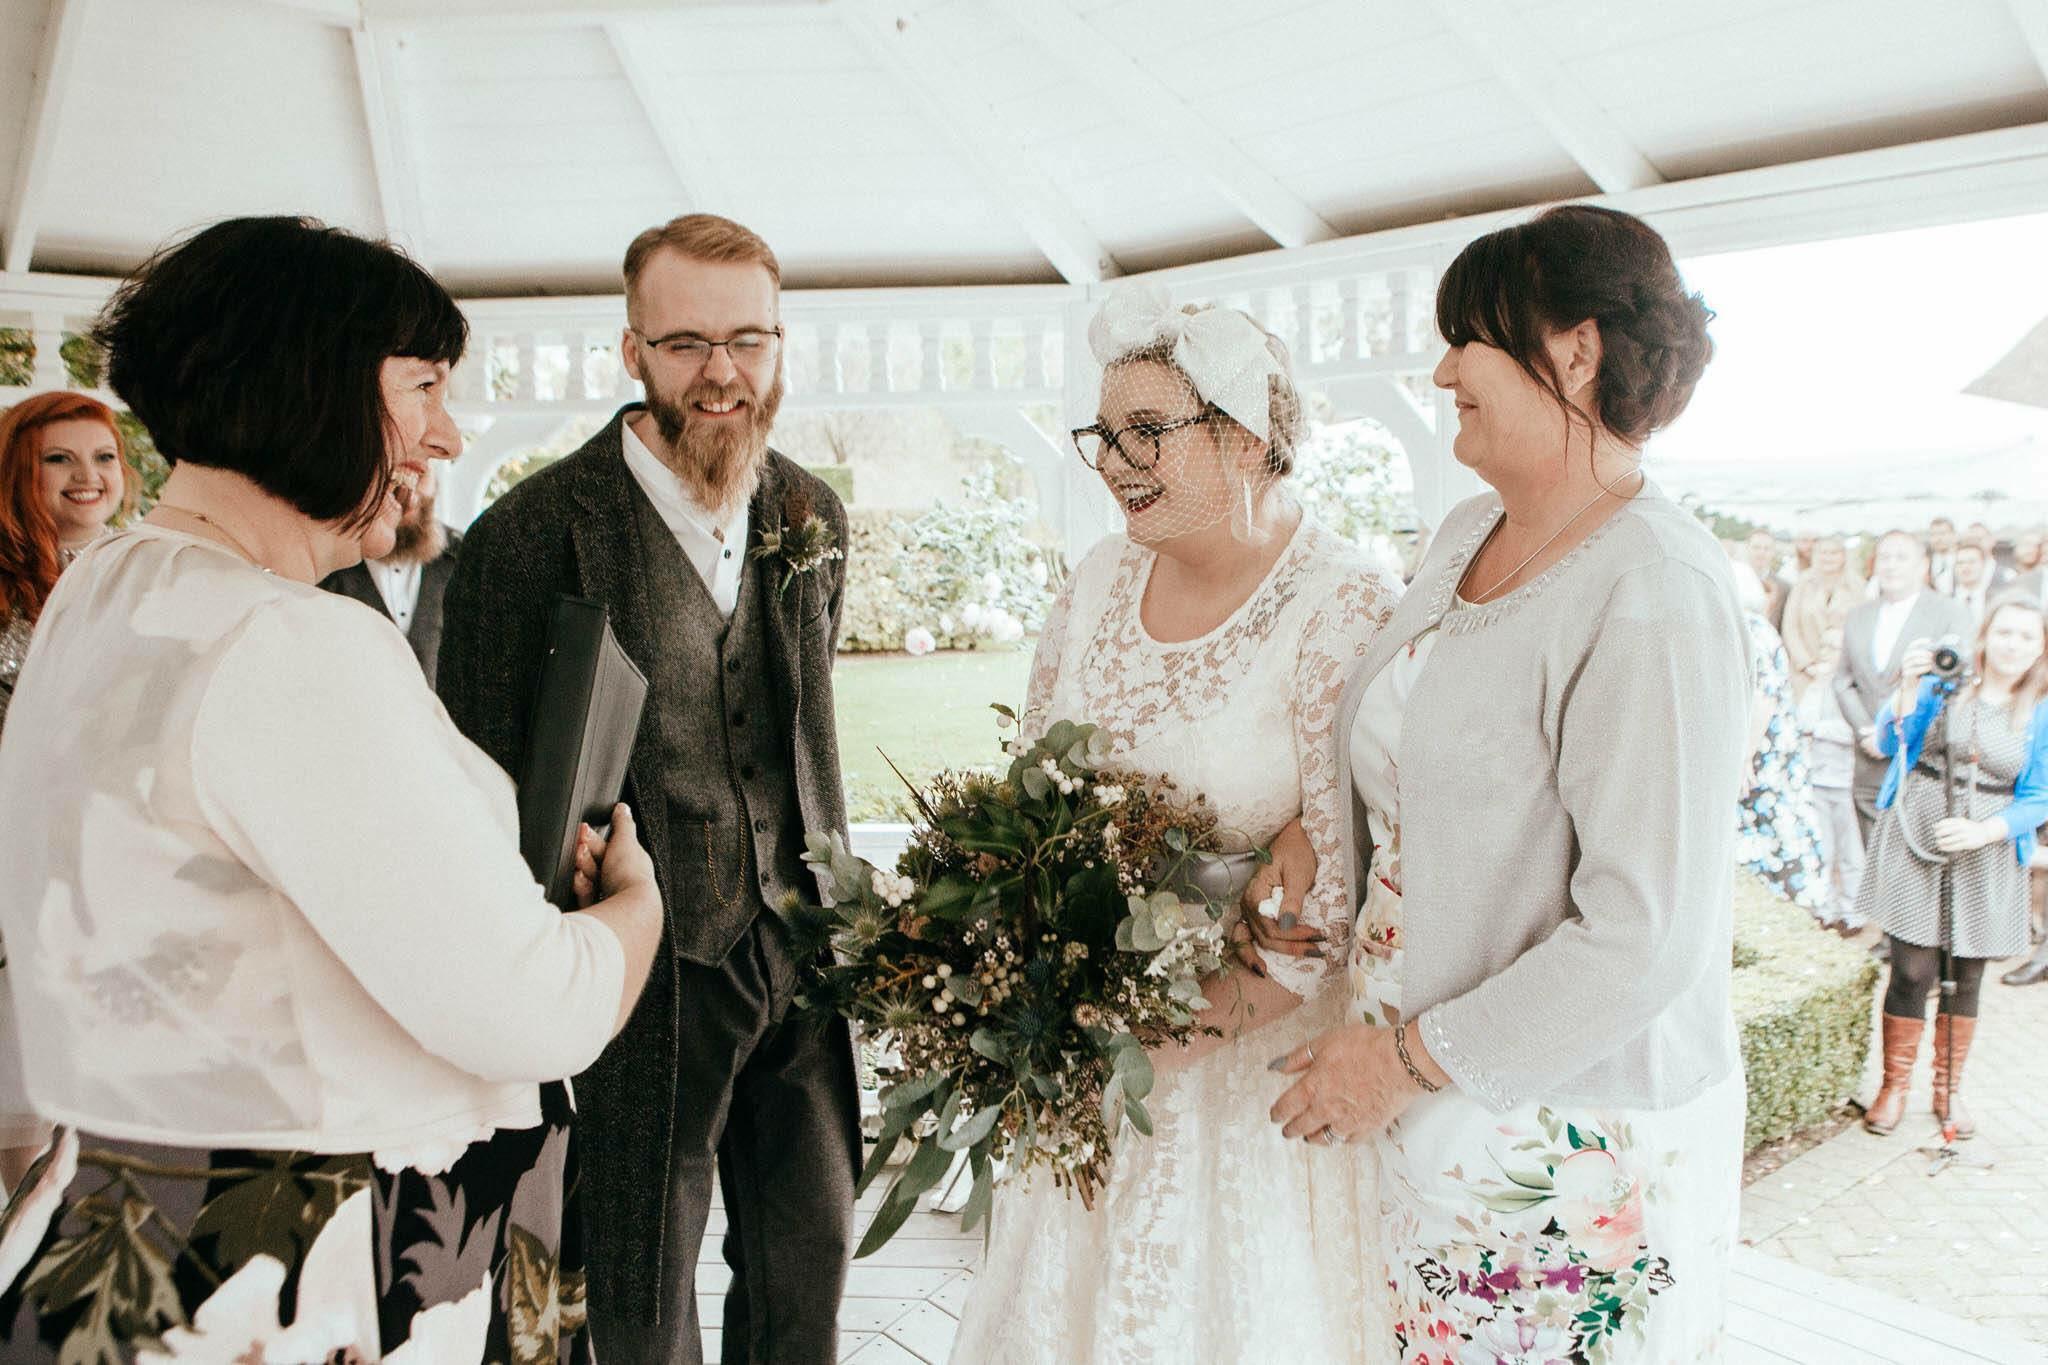 wedding-karina.jpg